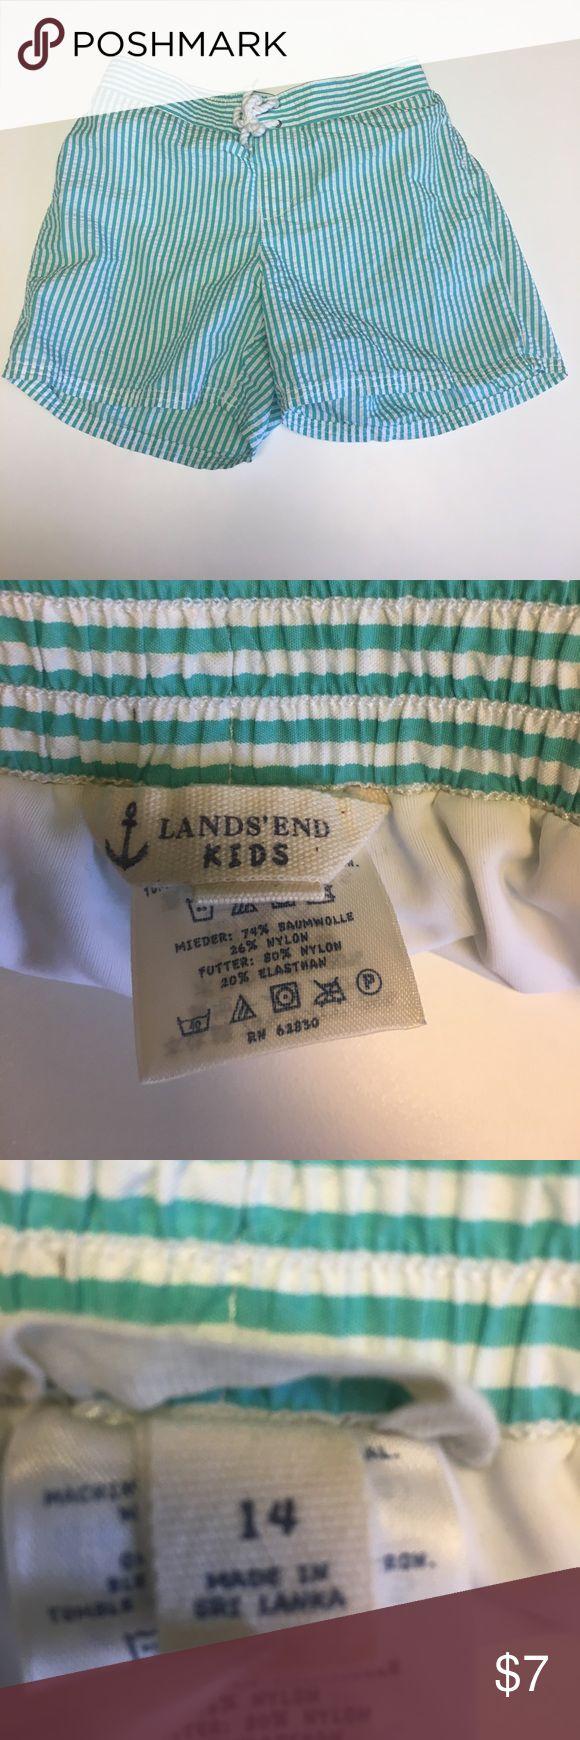 Lands' End Kids seersucker swim trunks 14 Lands' End Kids swim trunks size 14 teal green stripe seersucker Lands' End Swim Swim Trunks